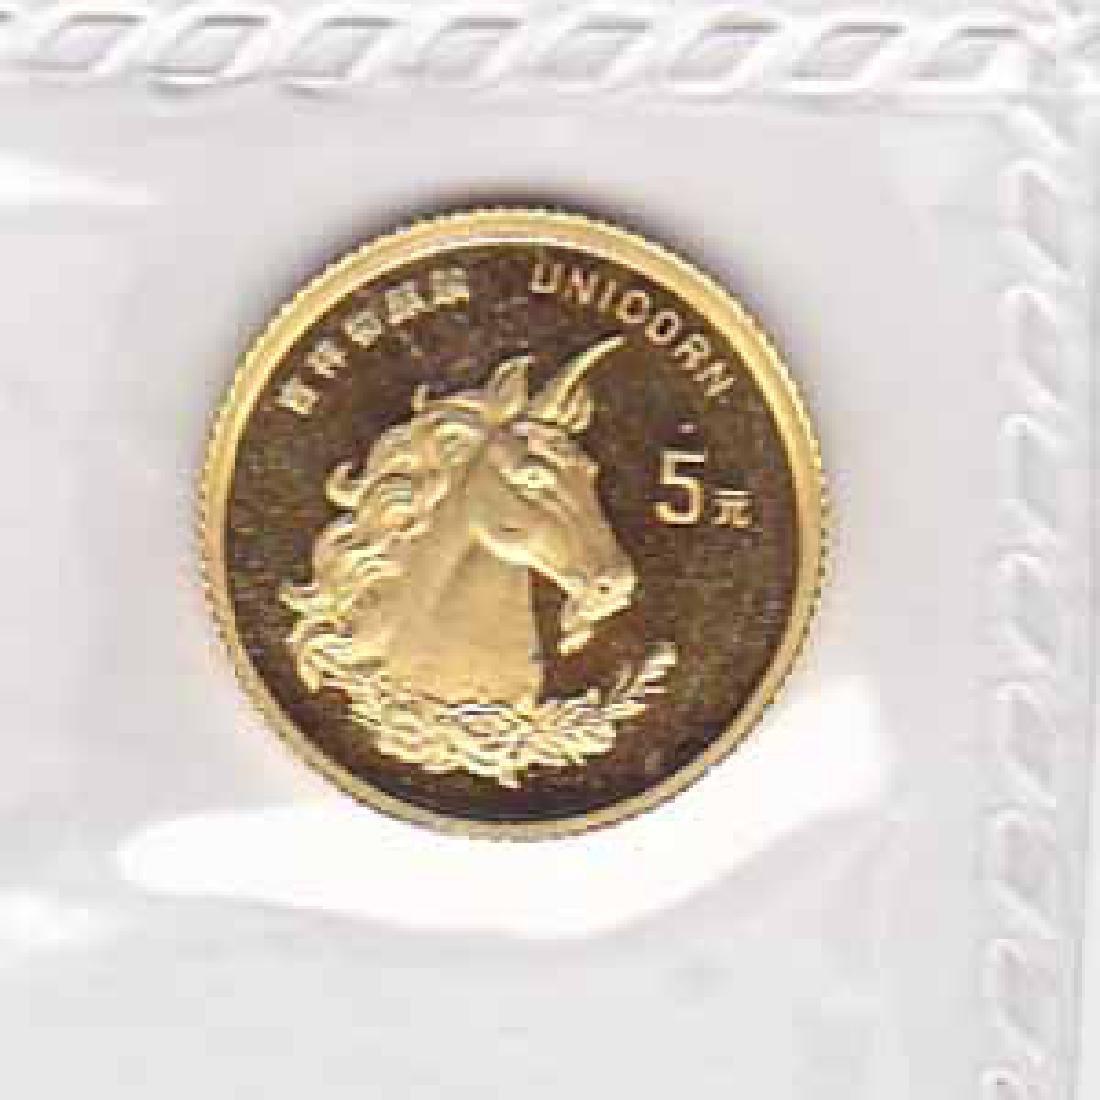 China 5 Yuan 1/20th ounce gold 1996 Unicorn